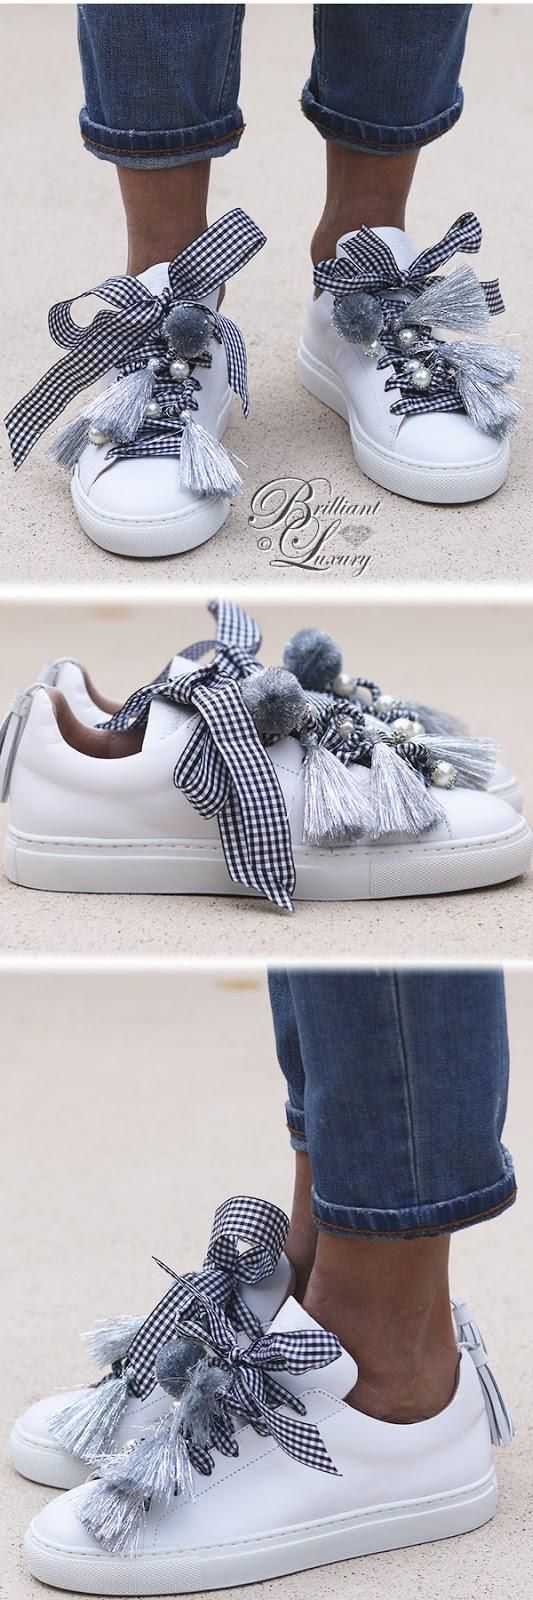 Brilliant Luxury ♦ Alameda Turquesa The Silver white sneakers